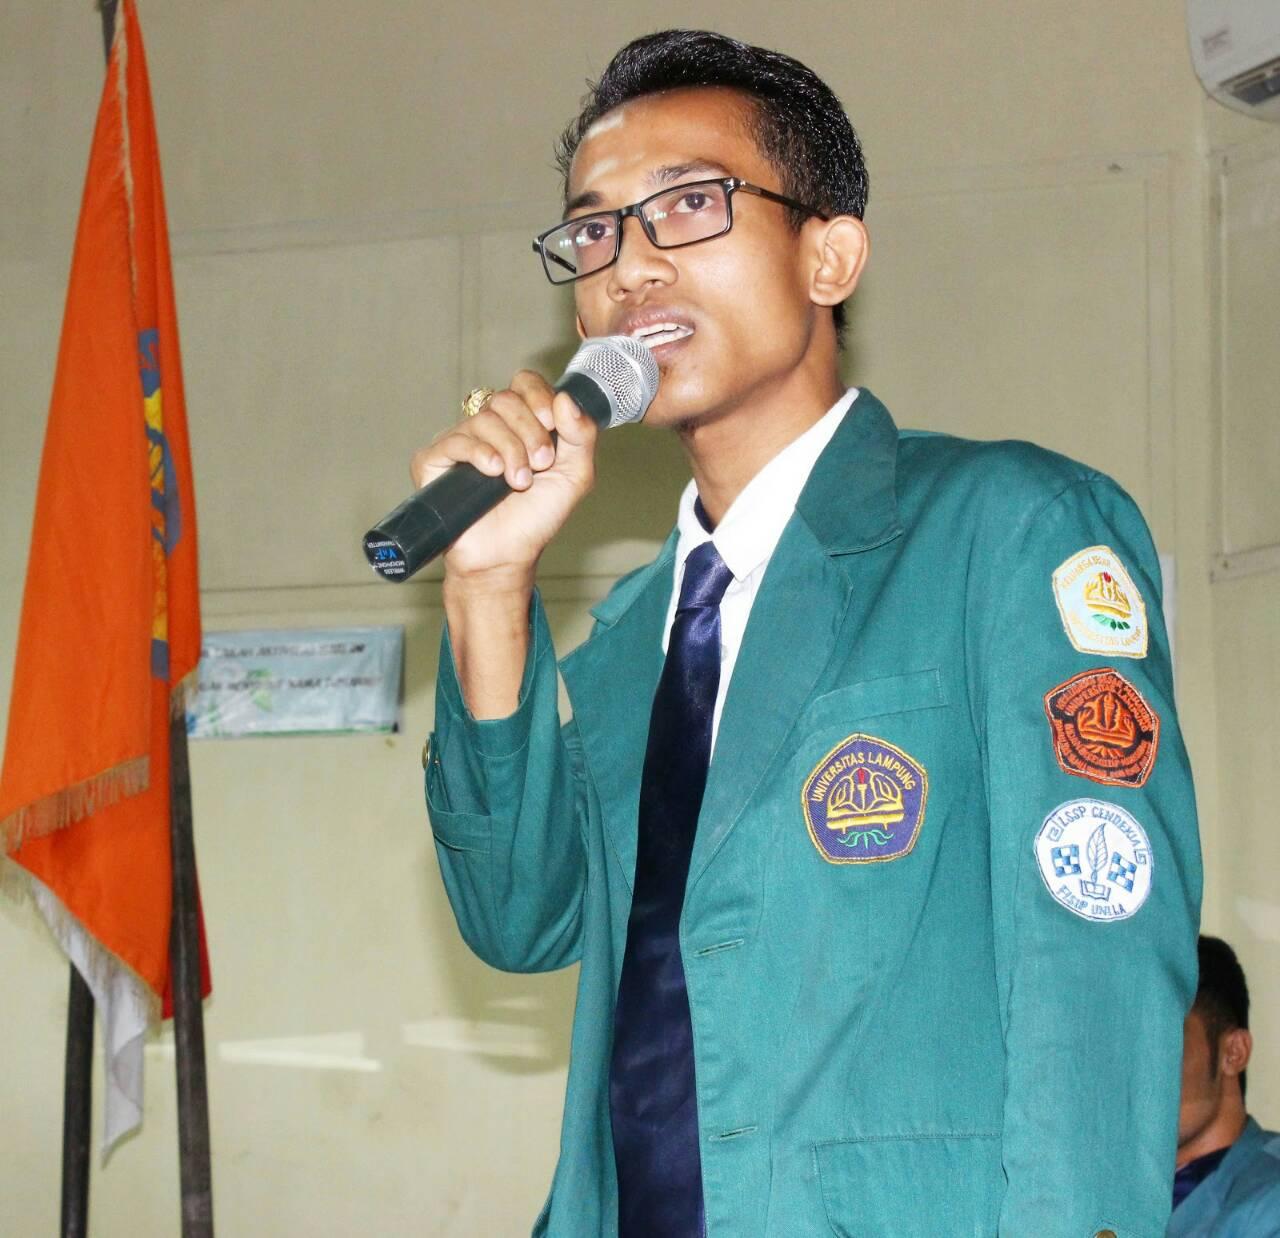 Lowongan Pekerjaan Departemen Pertanian Daftar Pekerjaan Sesuai Jurusan Kuliah Geniusedukasi Merajut Asa Demi Masa Depan Dan Cita Cita 1 Pendidikan Indonesia